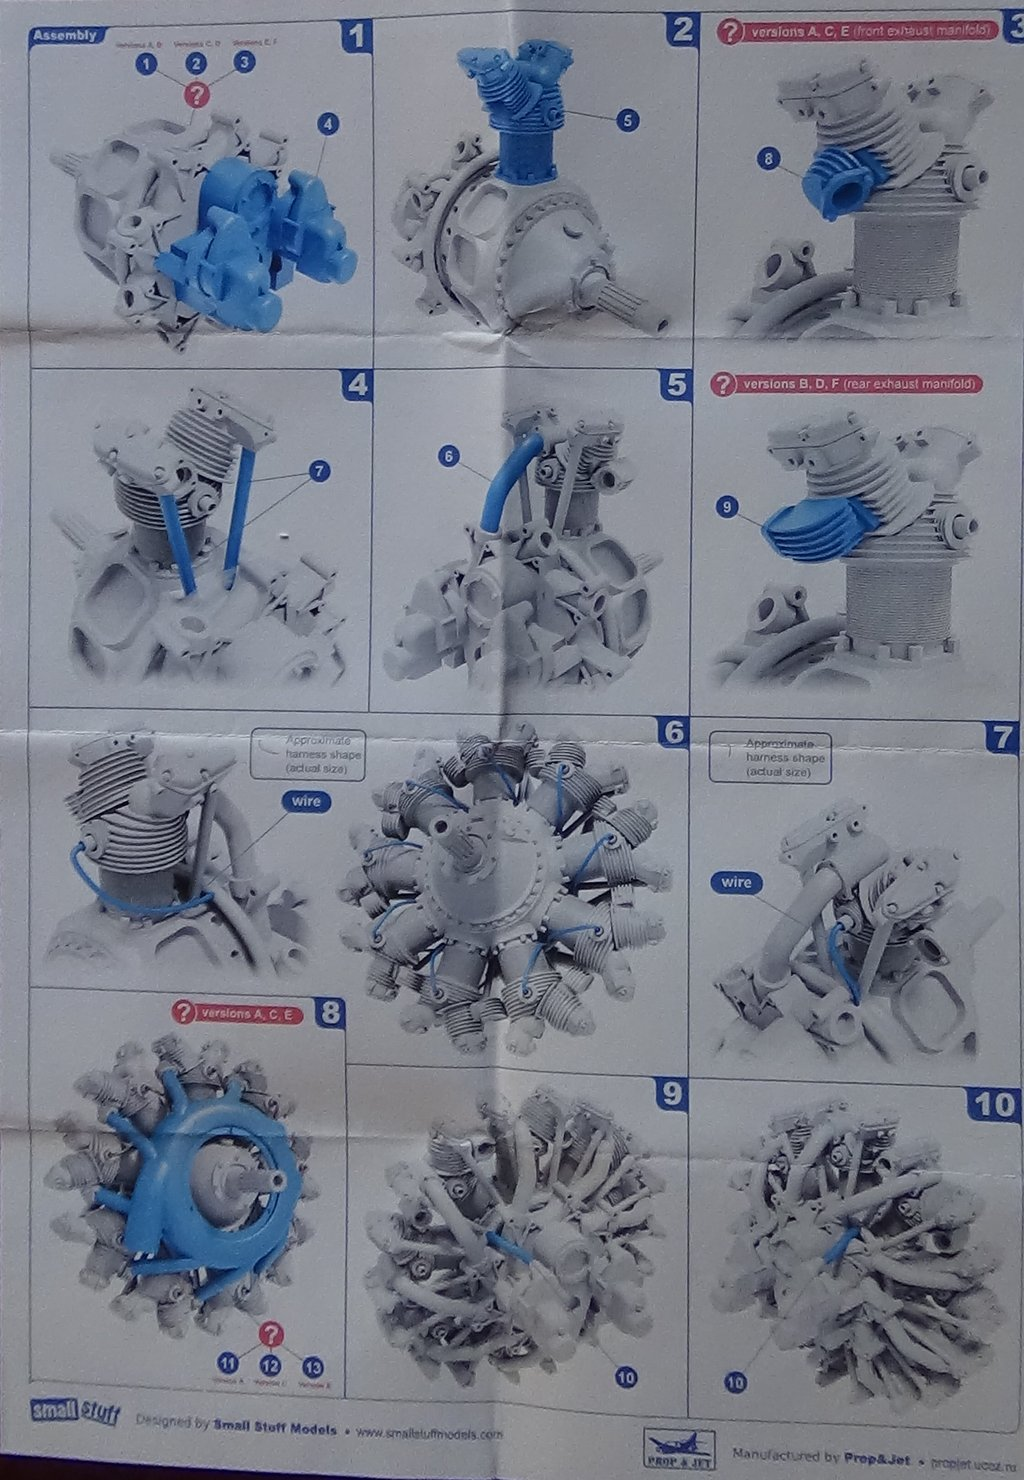 Derniers Achats - Page 4 NieAIb-Wright975-05